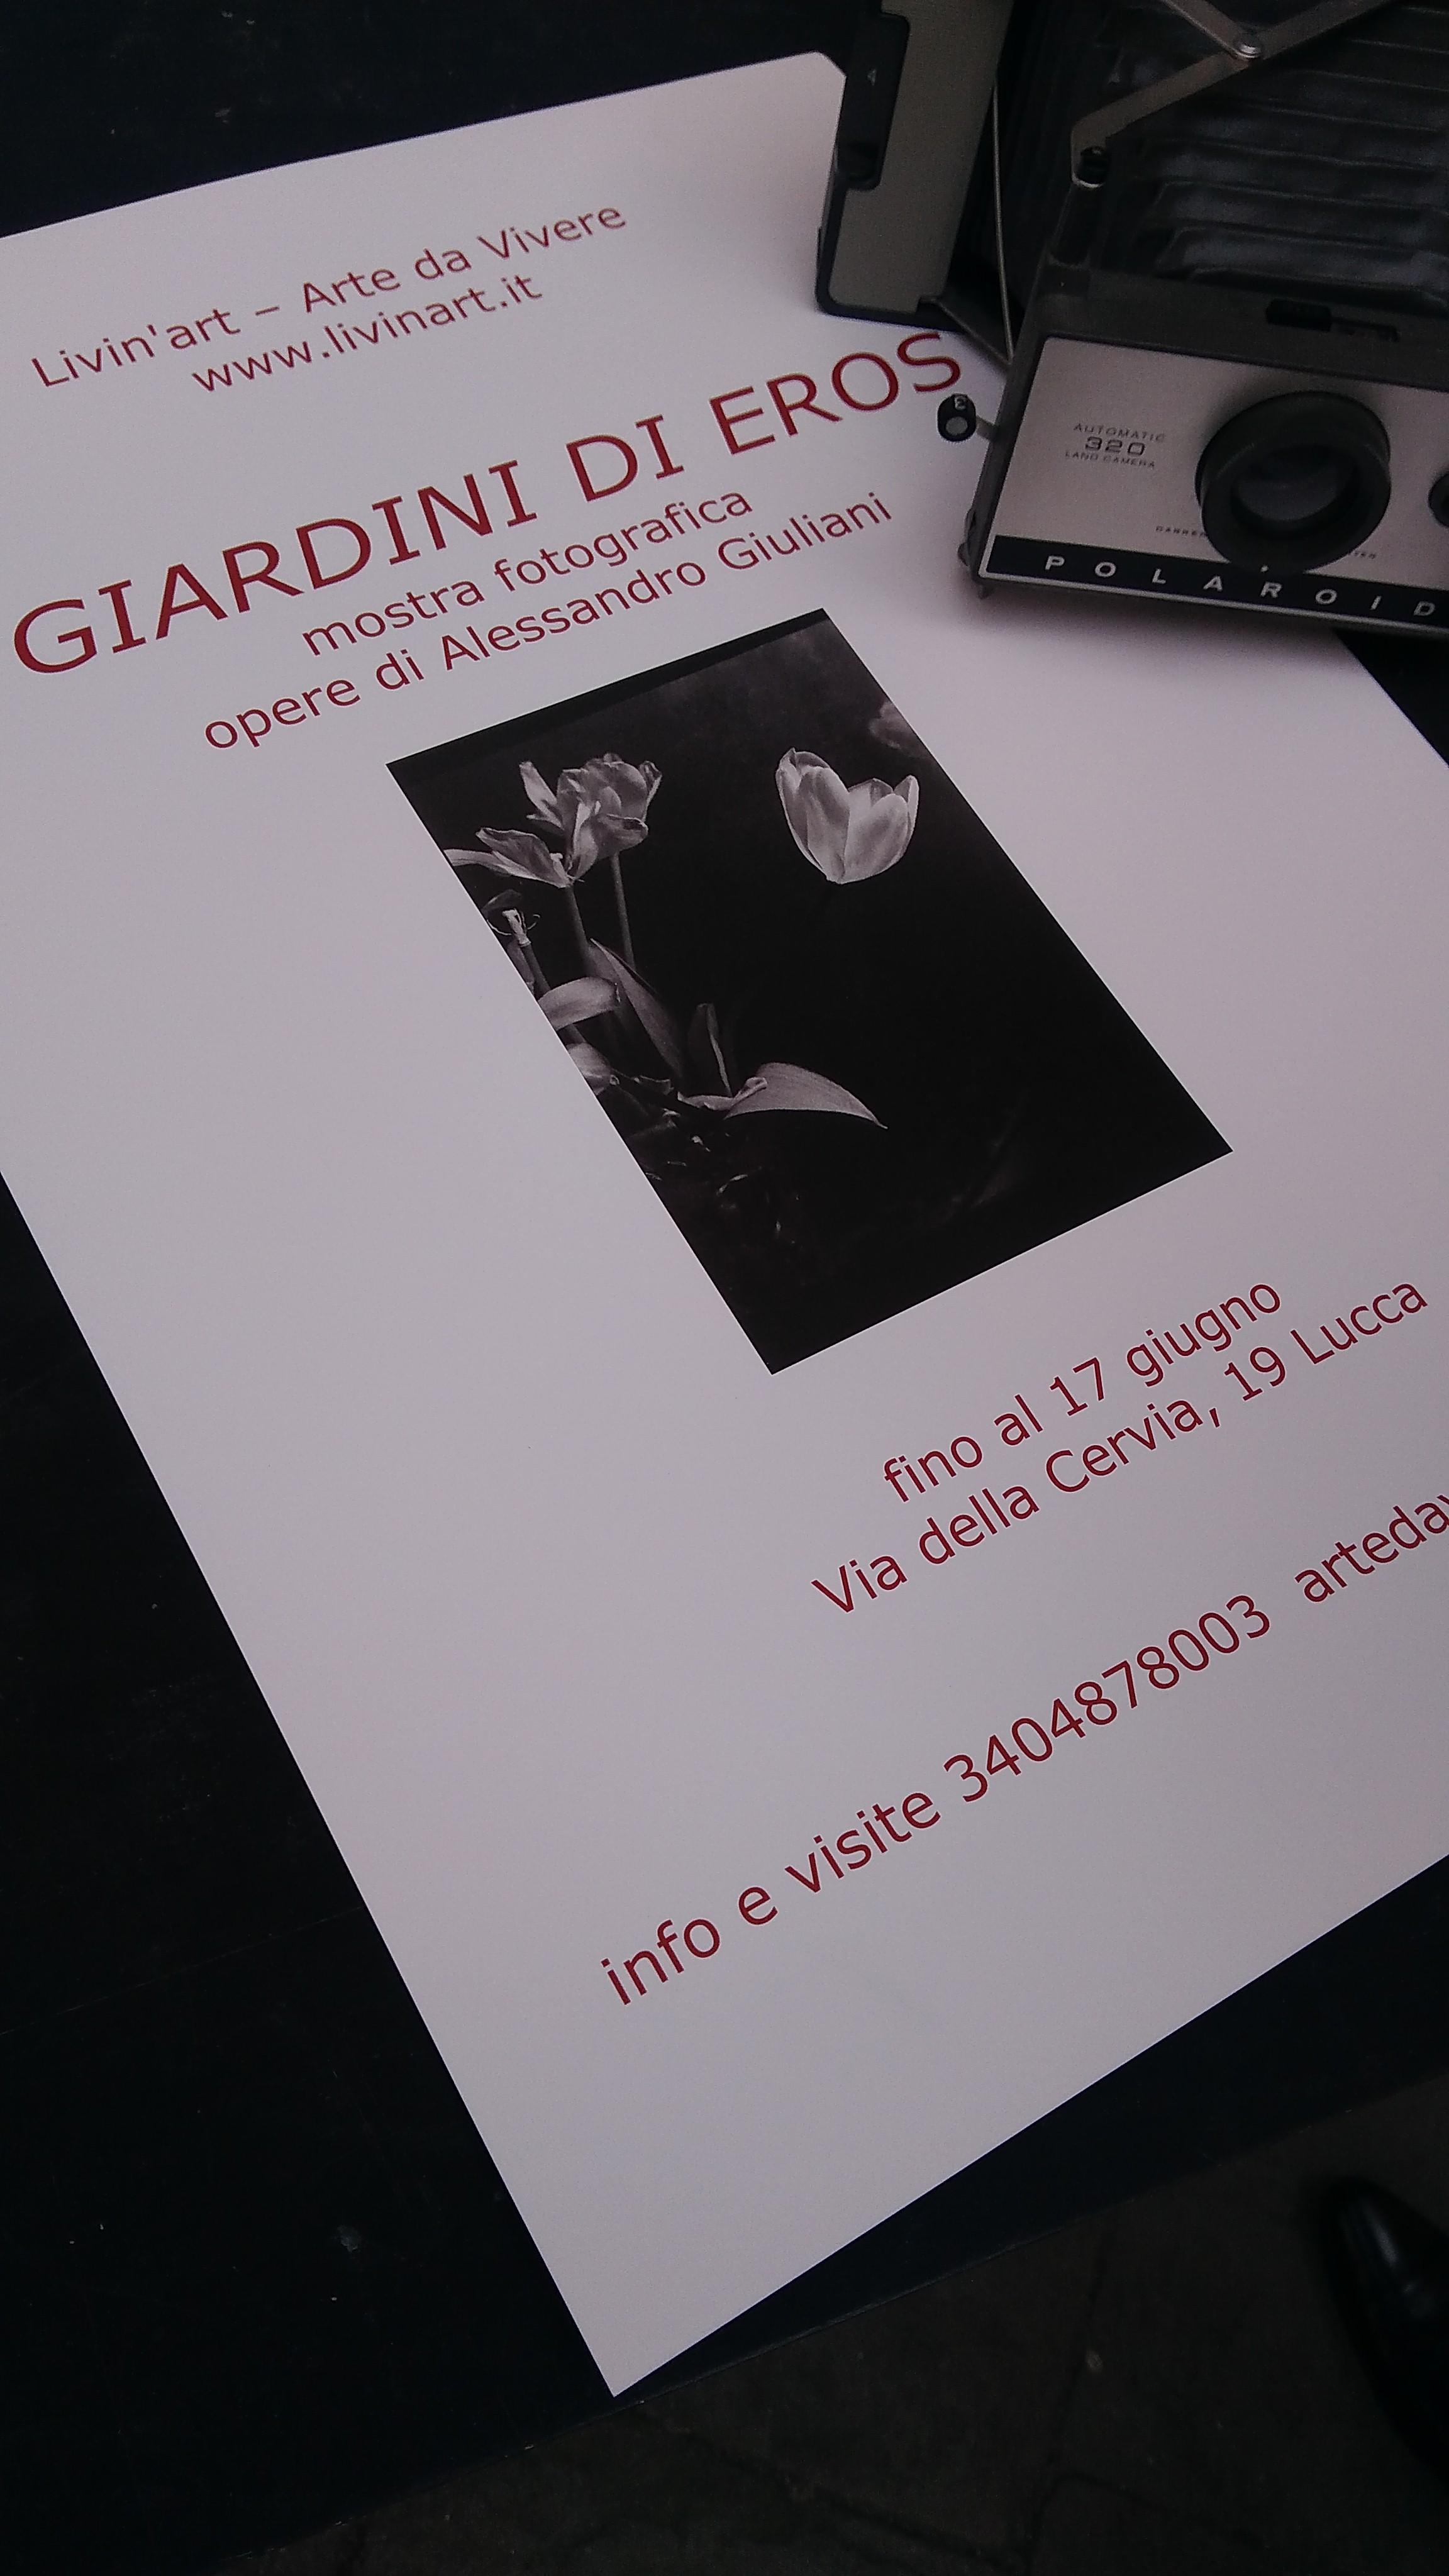 giardini-eros-mostra-fotografica-livin_art-giuliani